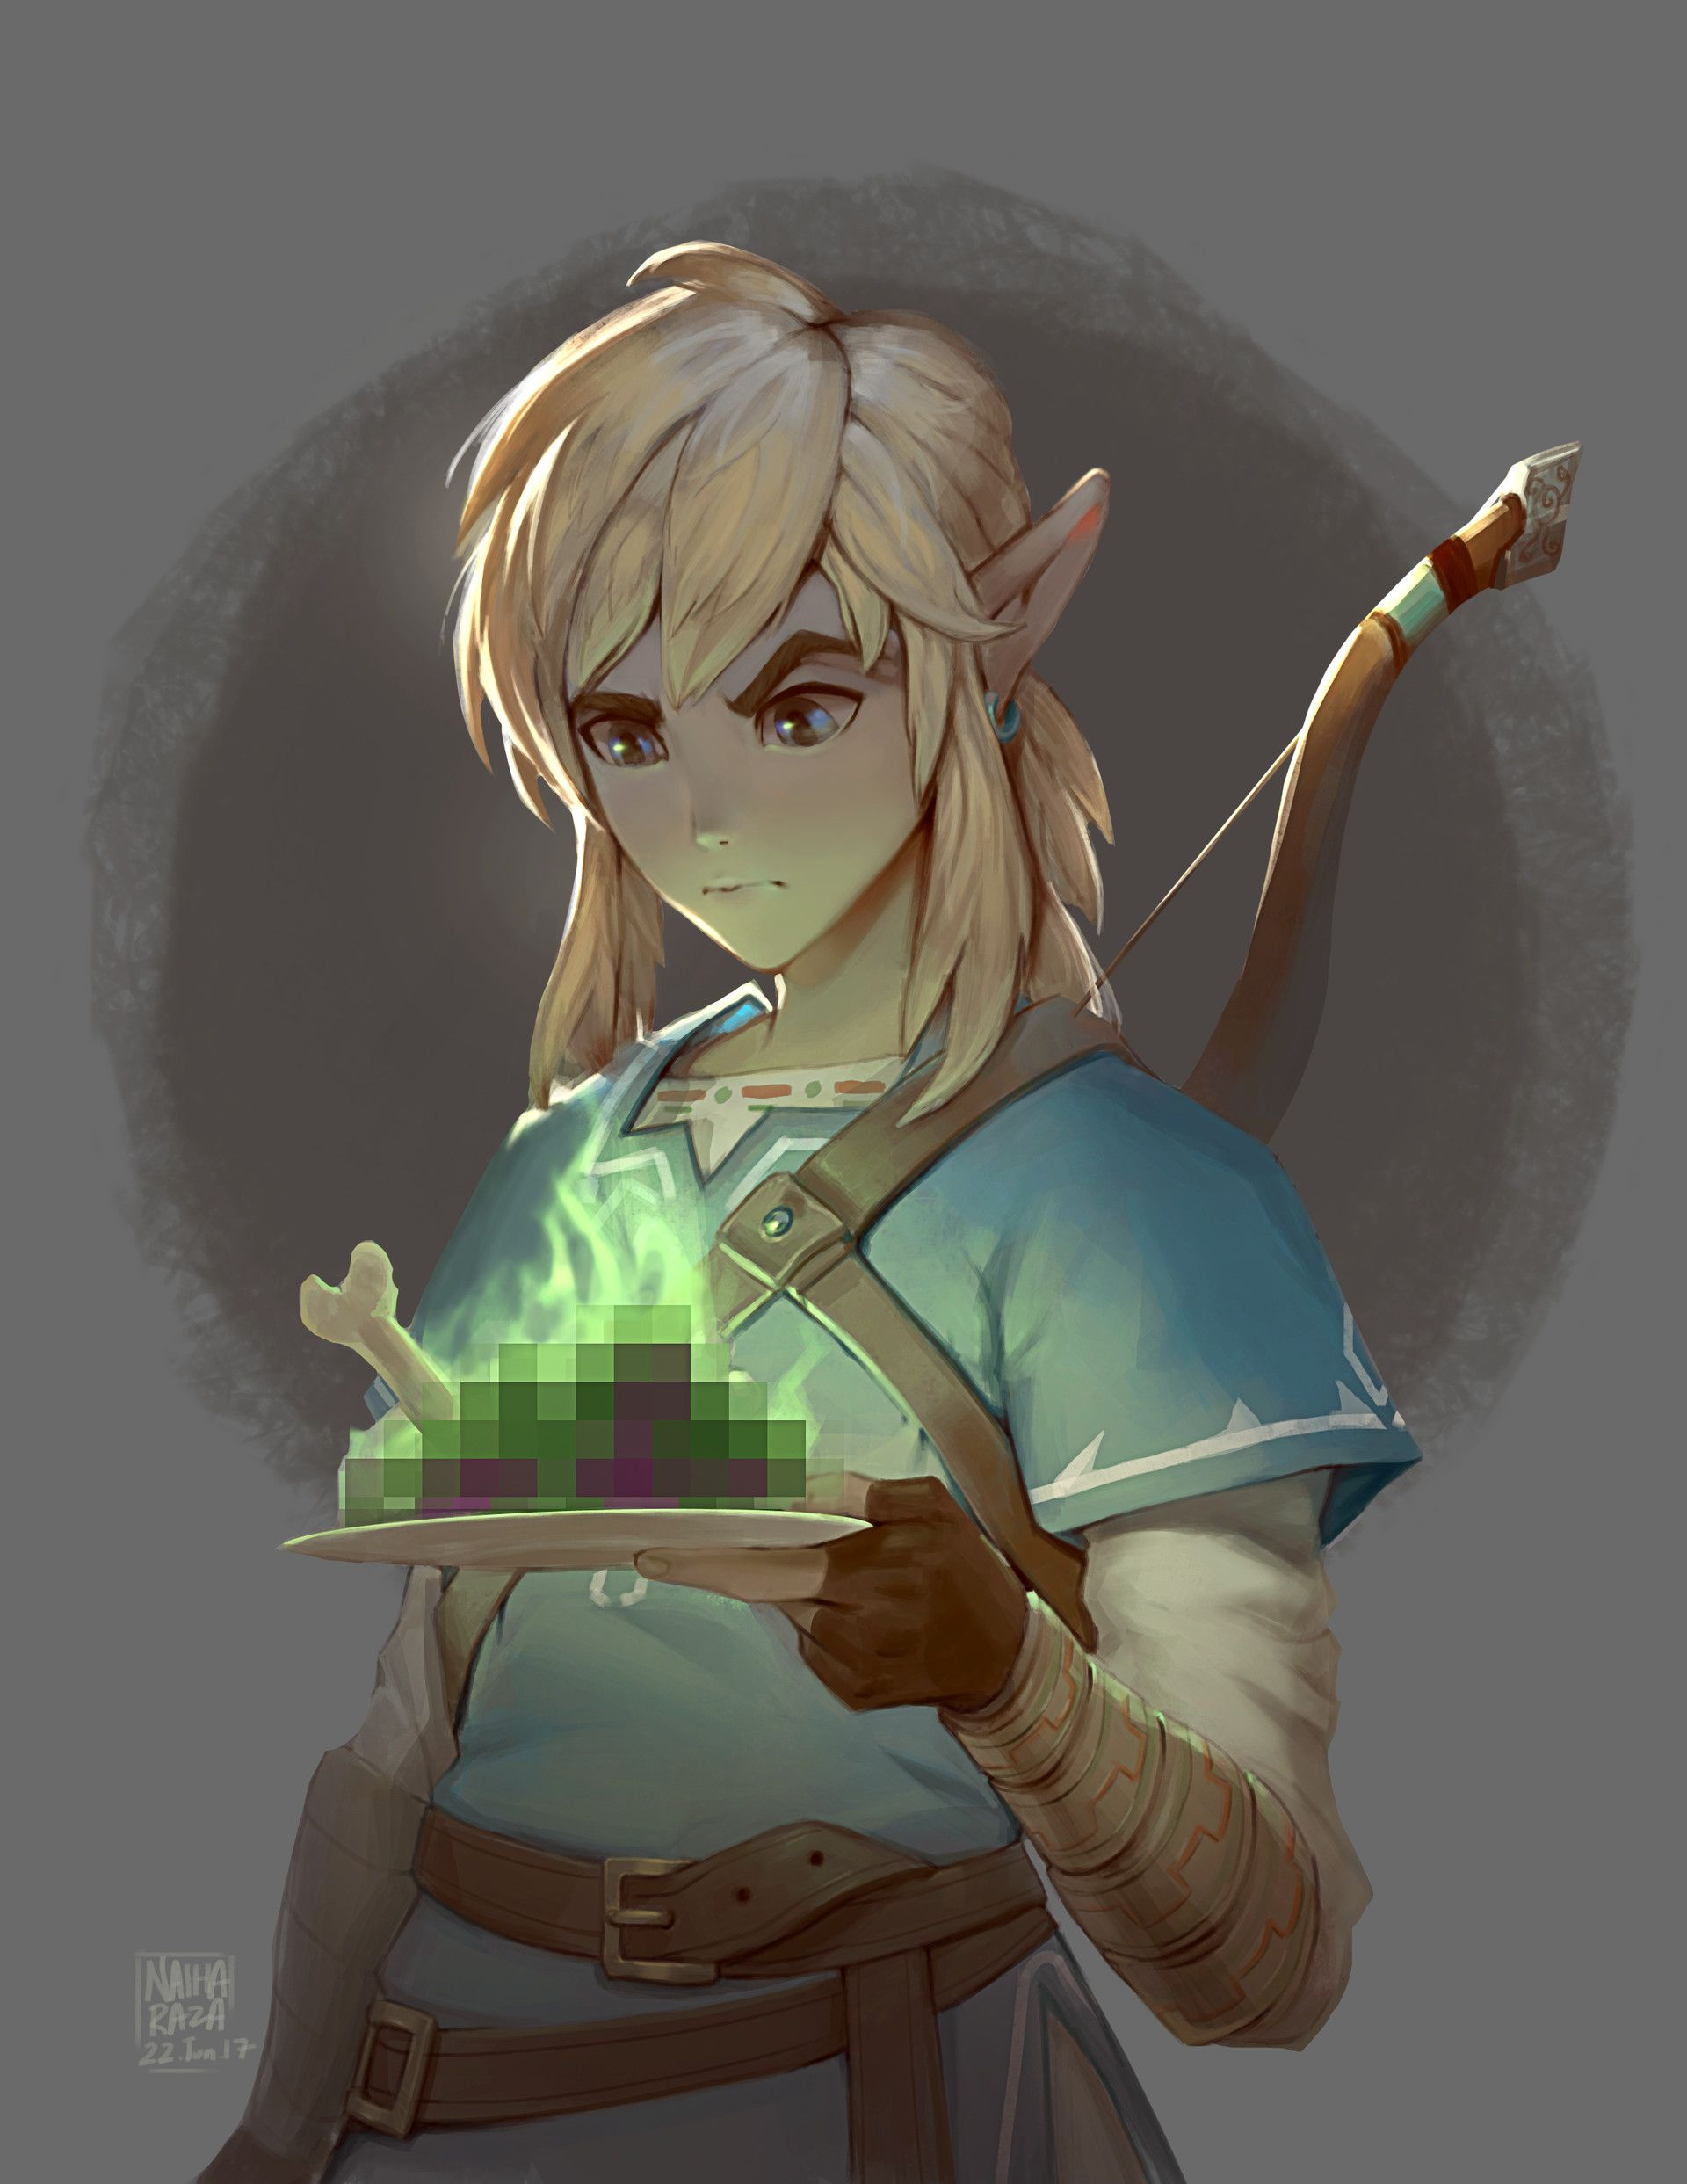 Pin By Margarita Huot On The Legend Of Zelda Pinterest Zelda